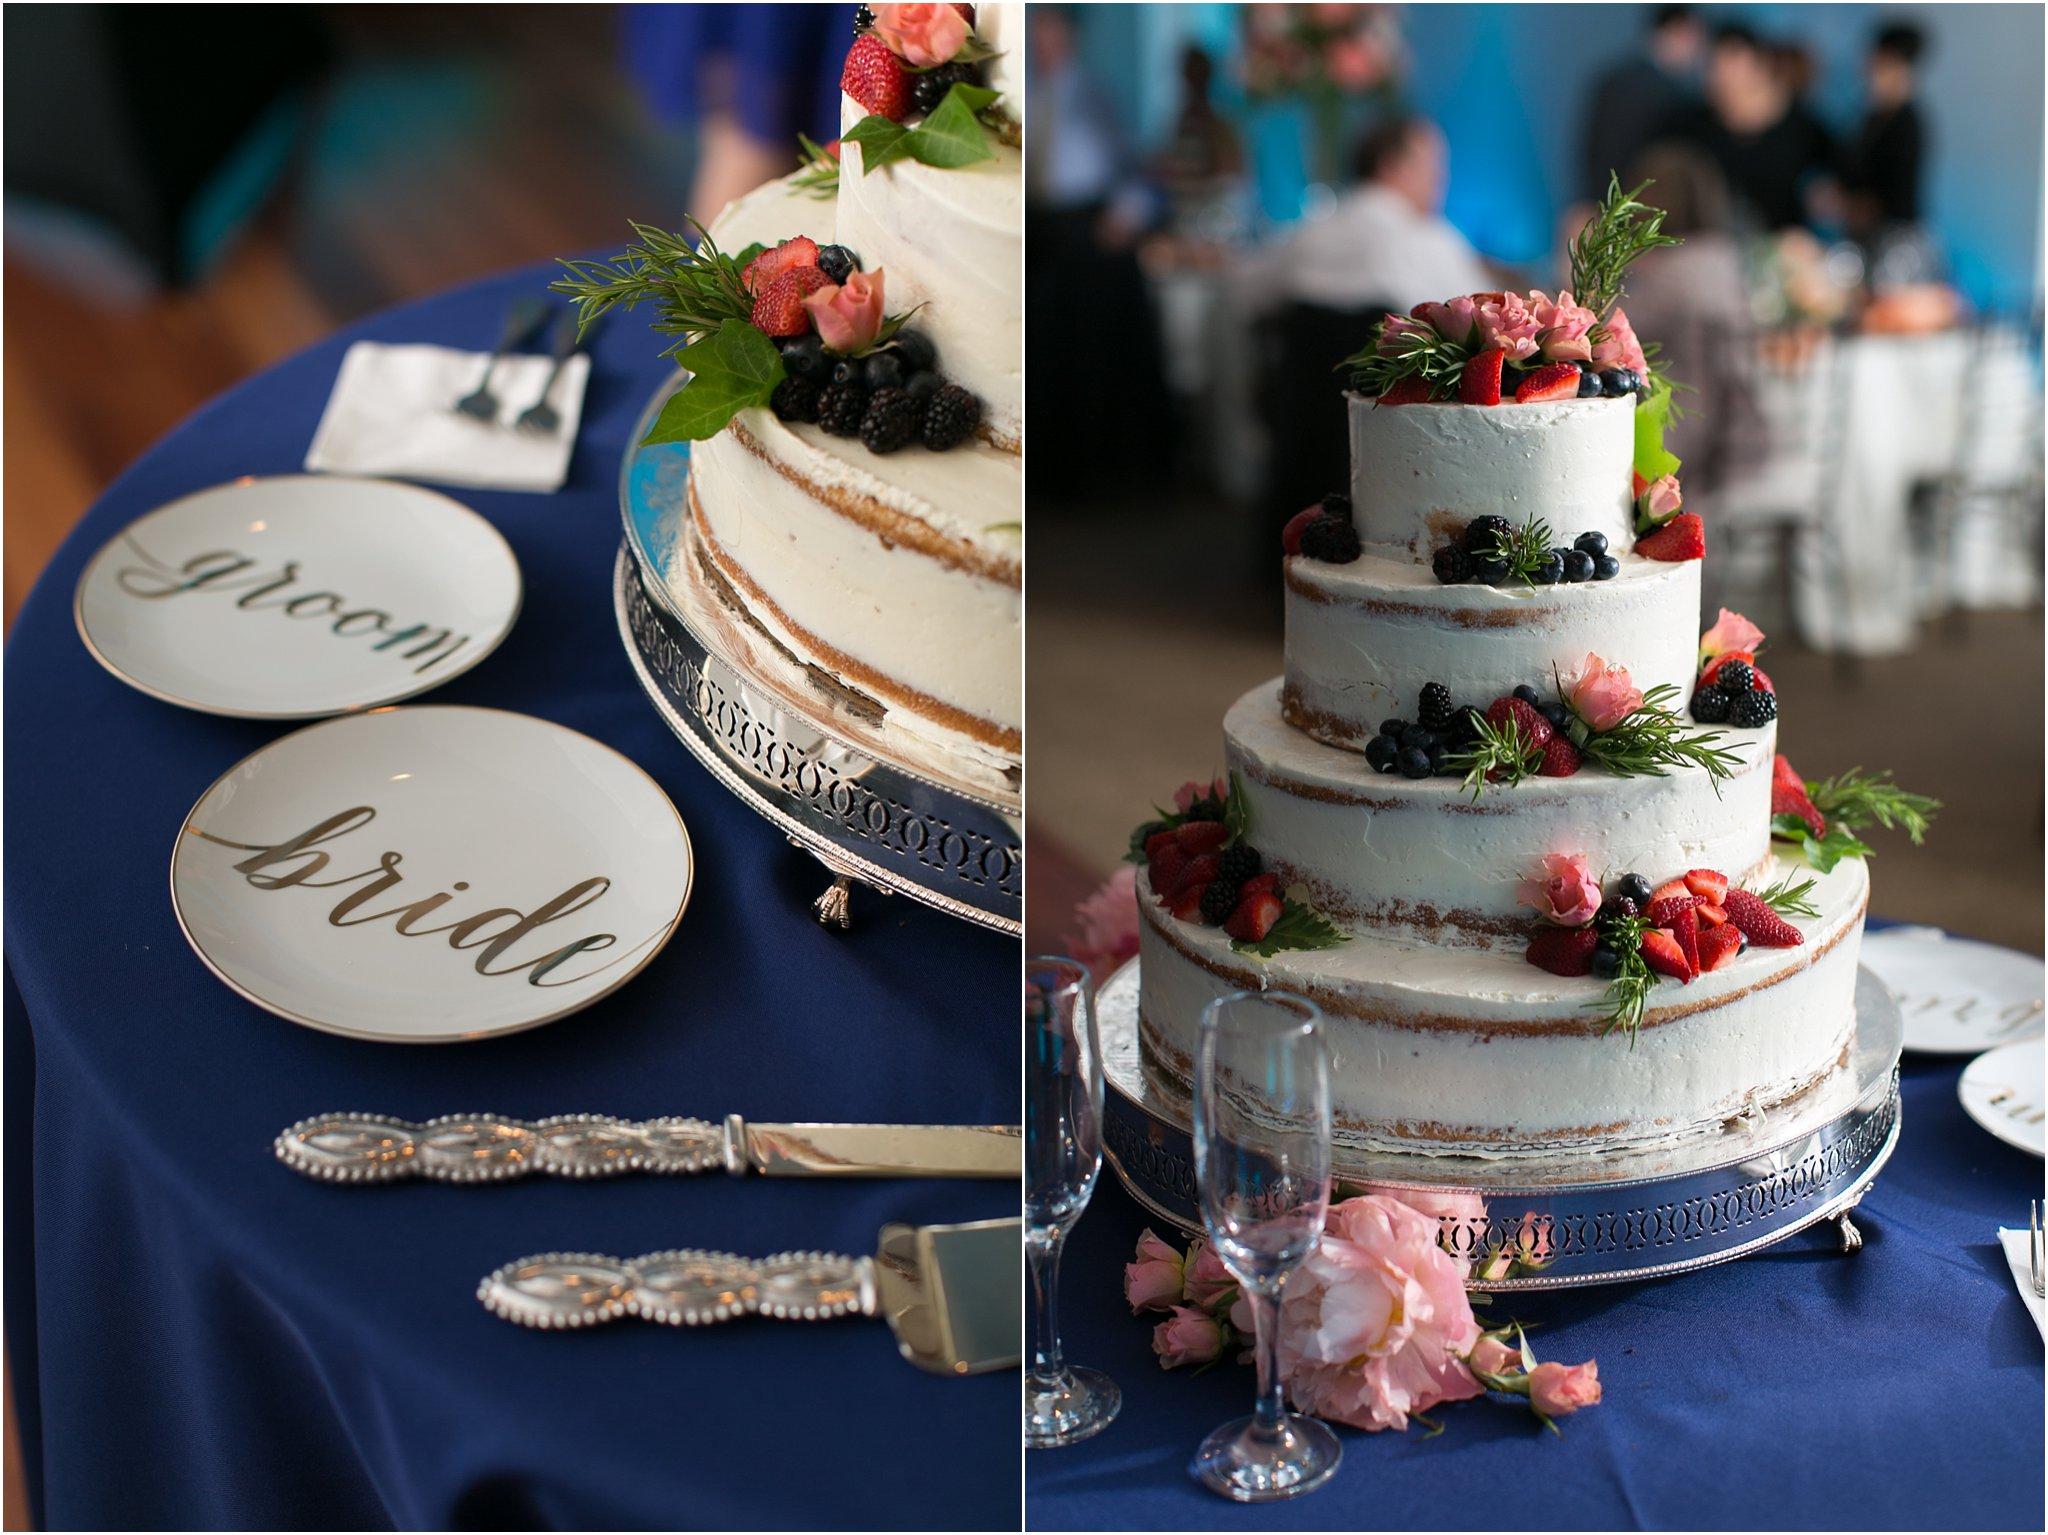 jessica_ryan_photography_wedding_photography_virginiabeach_virginia_candid_authentic_wedding_portraits_marina_shores_yacht_club_chesapeake_bay_1921